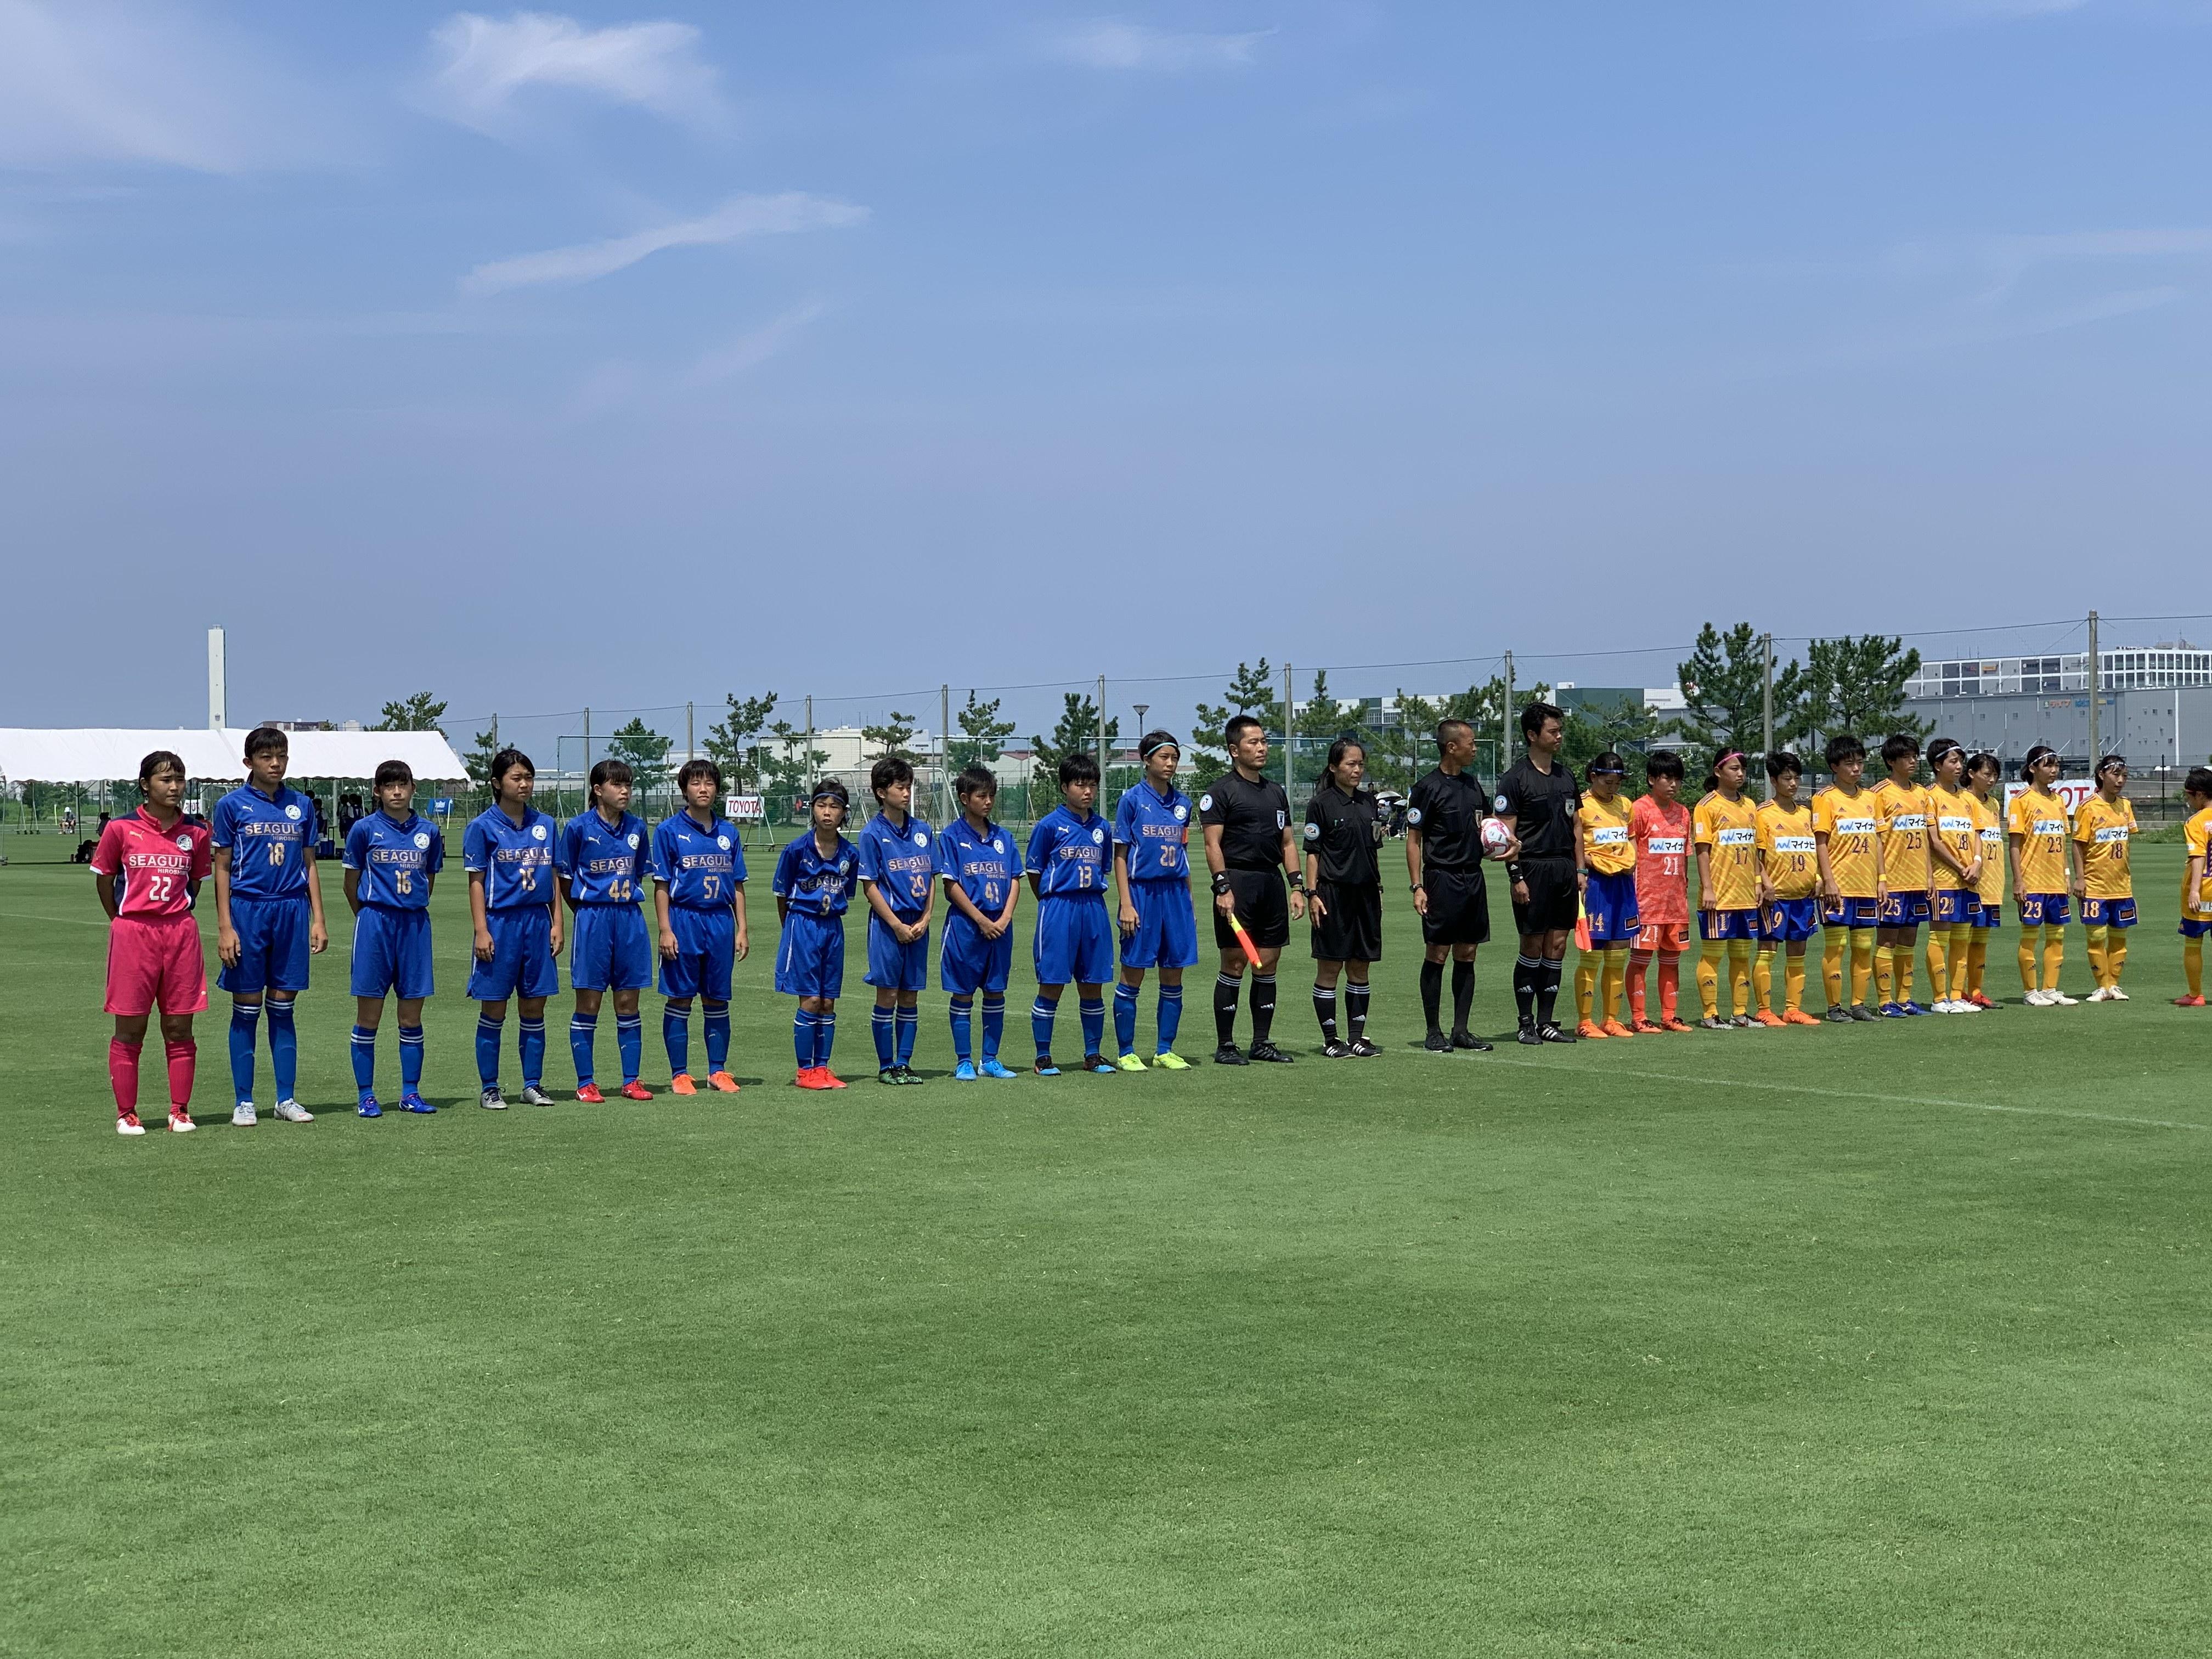 第24回全日本U-15女子サッカー選手権大会1.jpeg